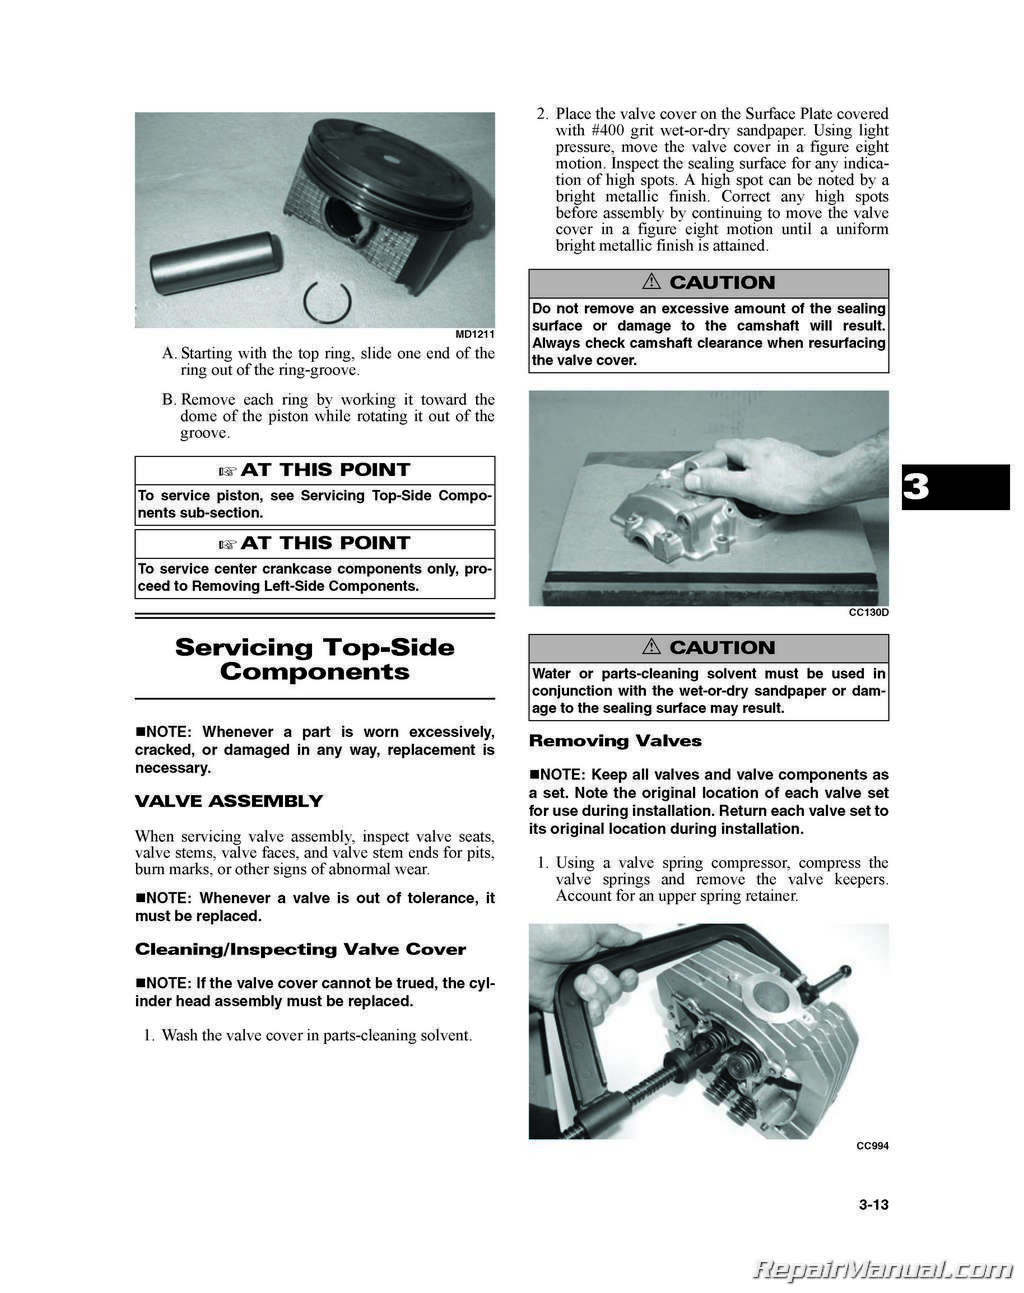 kymco mxu 150 atv service manual printed by cyclepedia rh repairmanual com